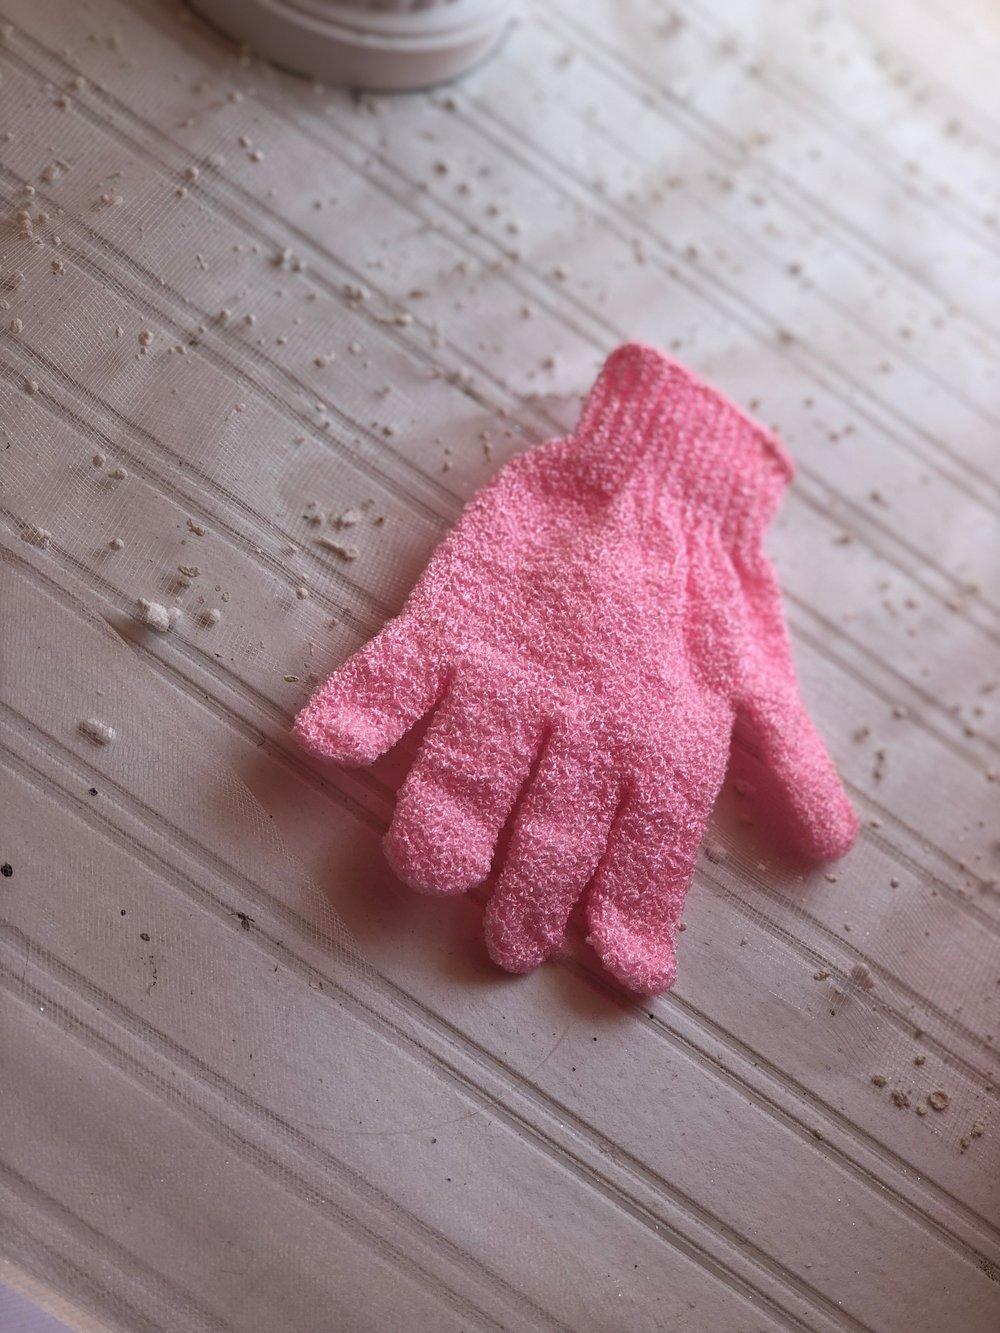 Image of Velvet Exfoliating Glove